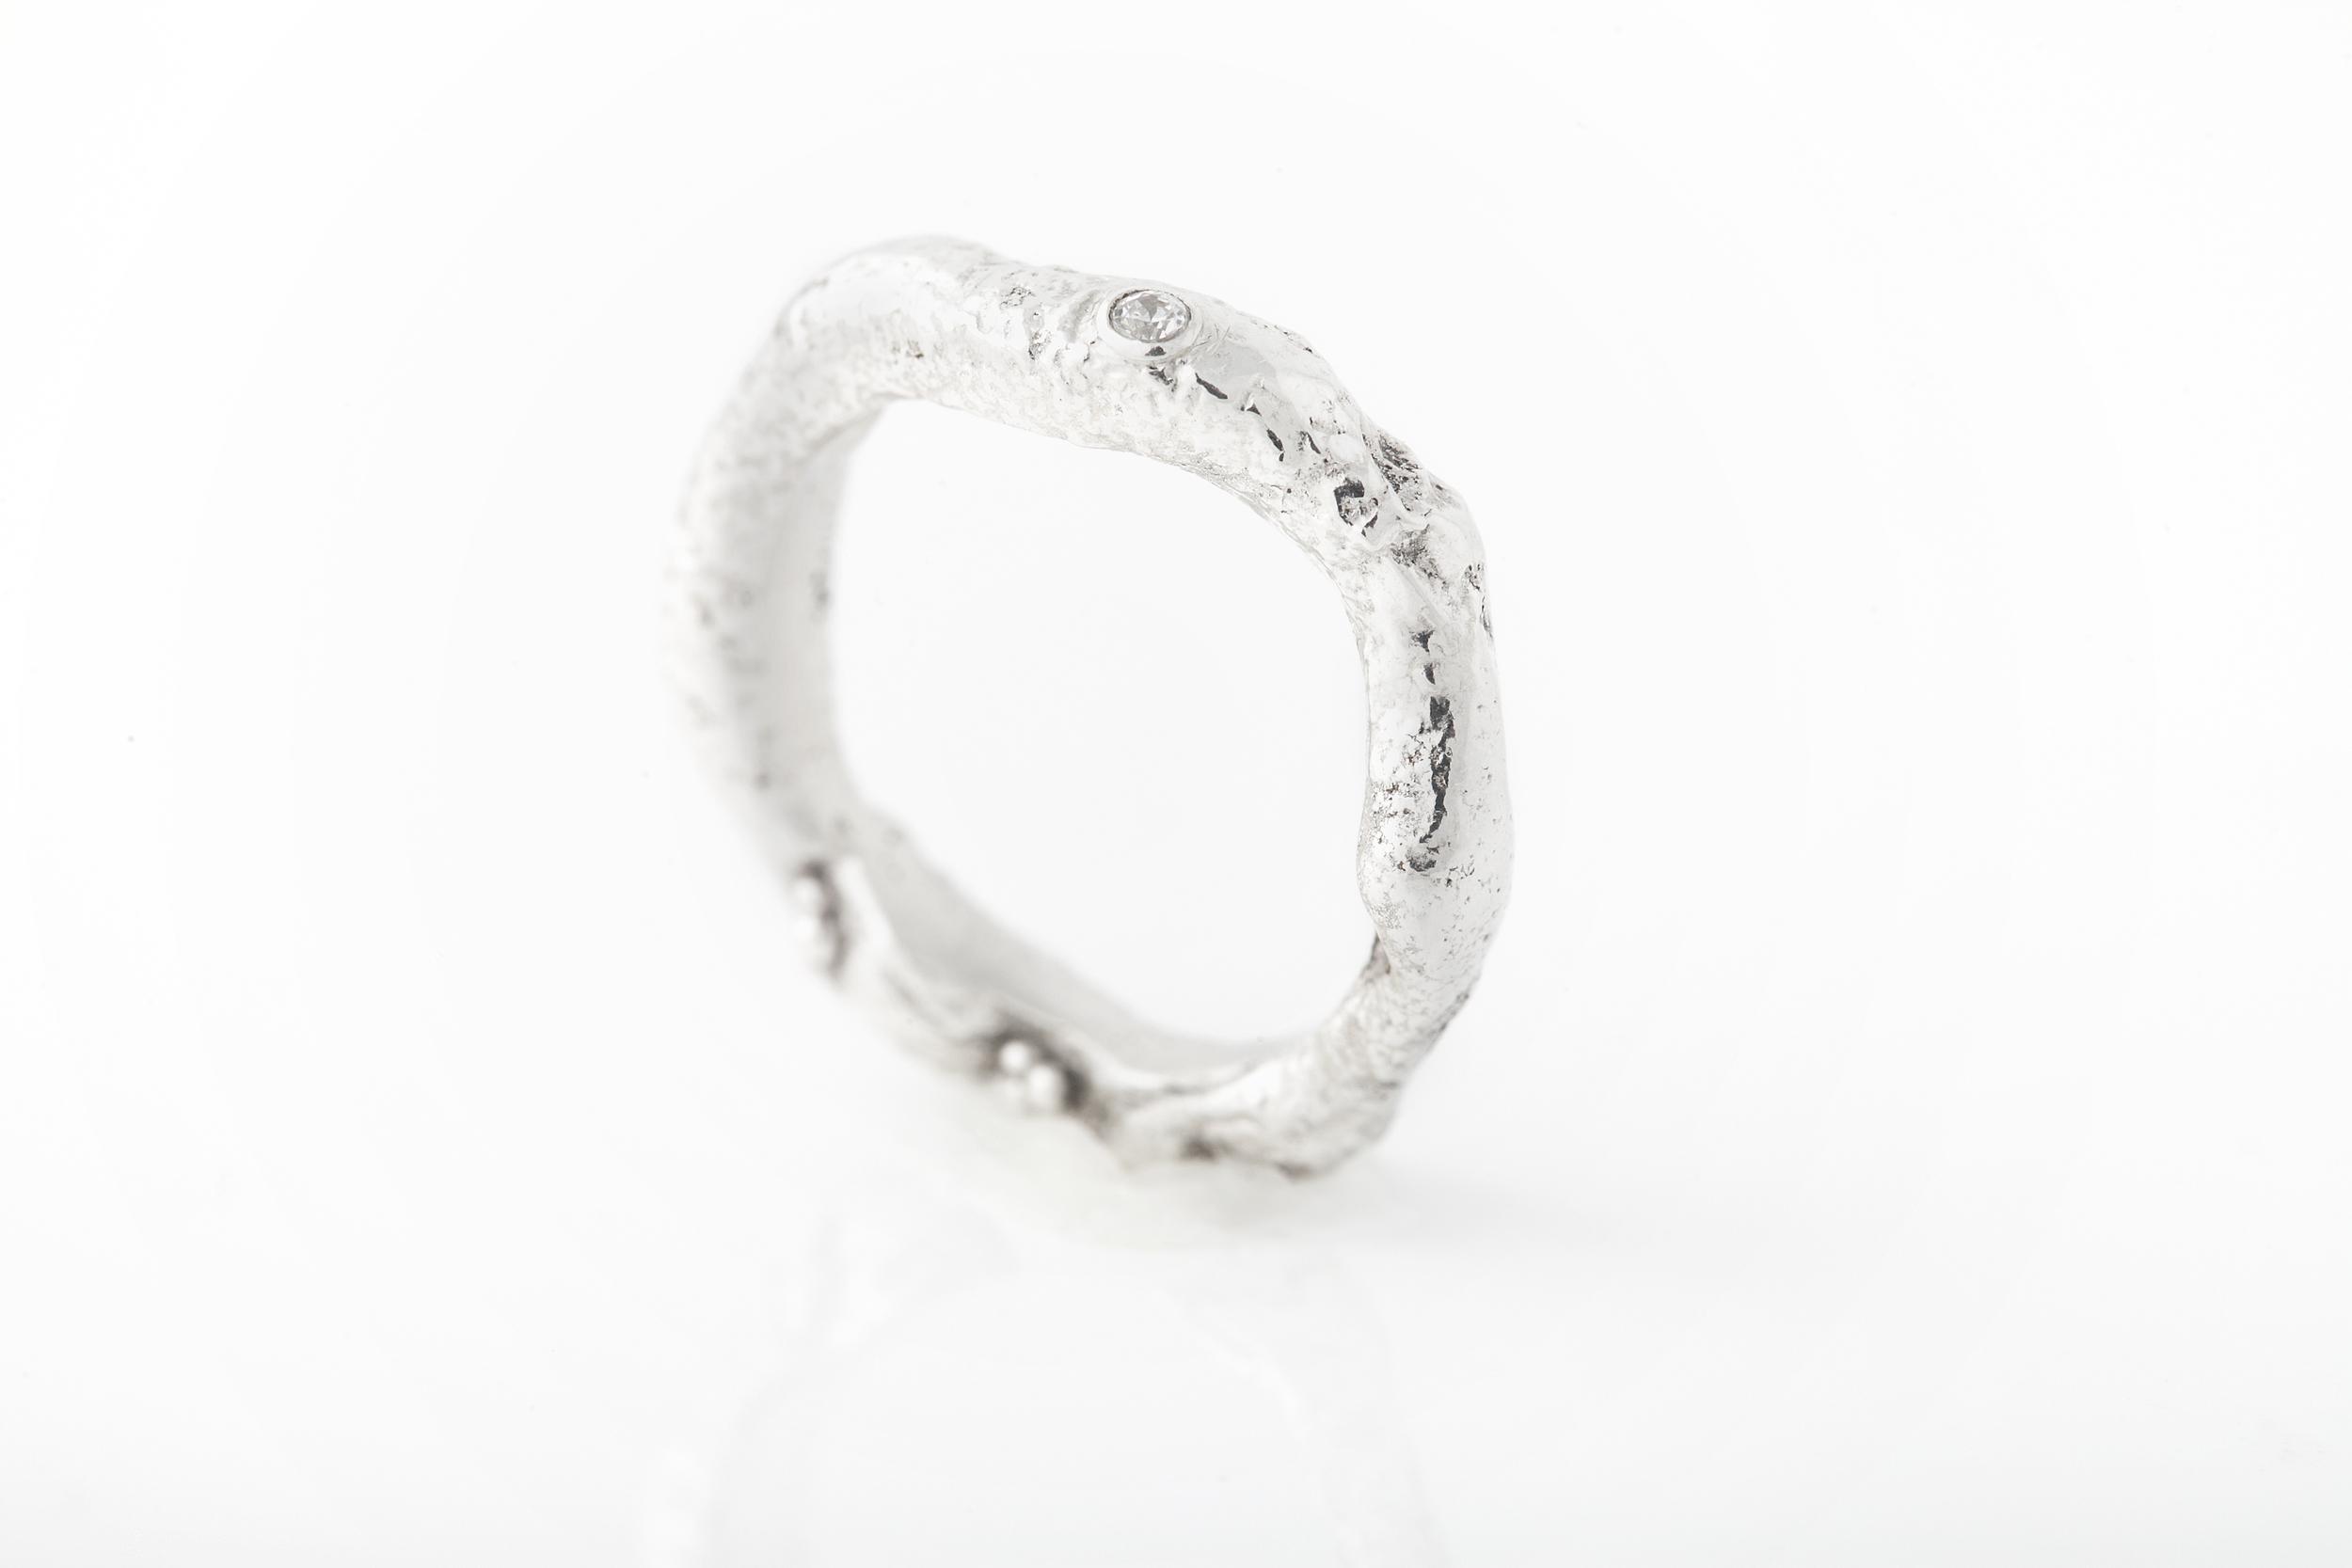 Custom wedding band - Reticulated sterling silver, fine silver granulation, lab-grown diamond.